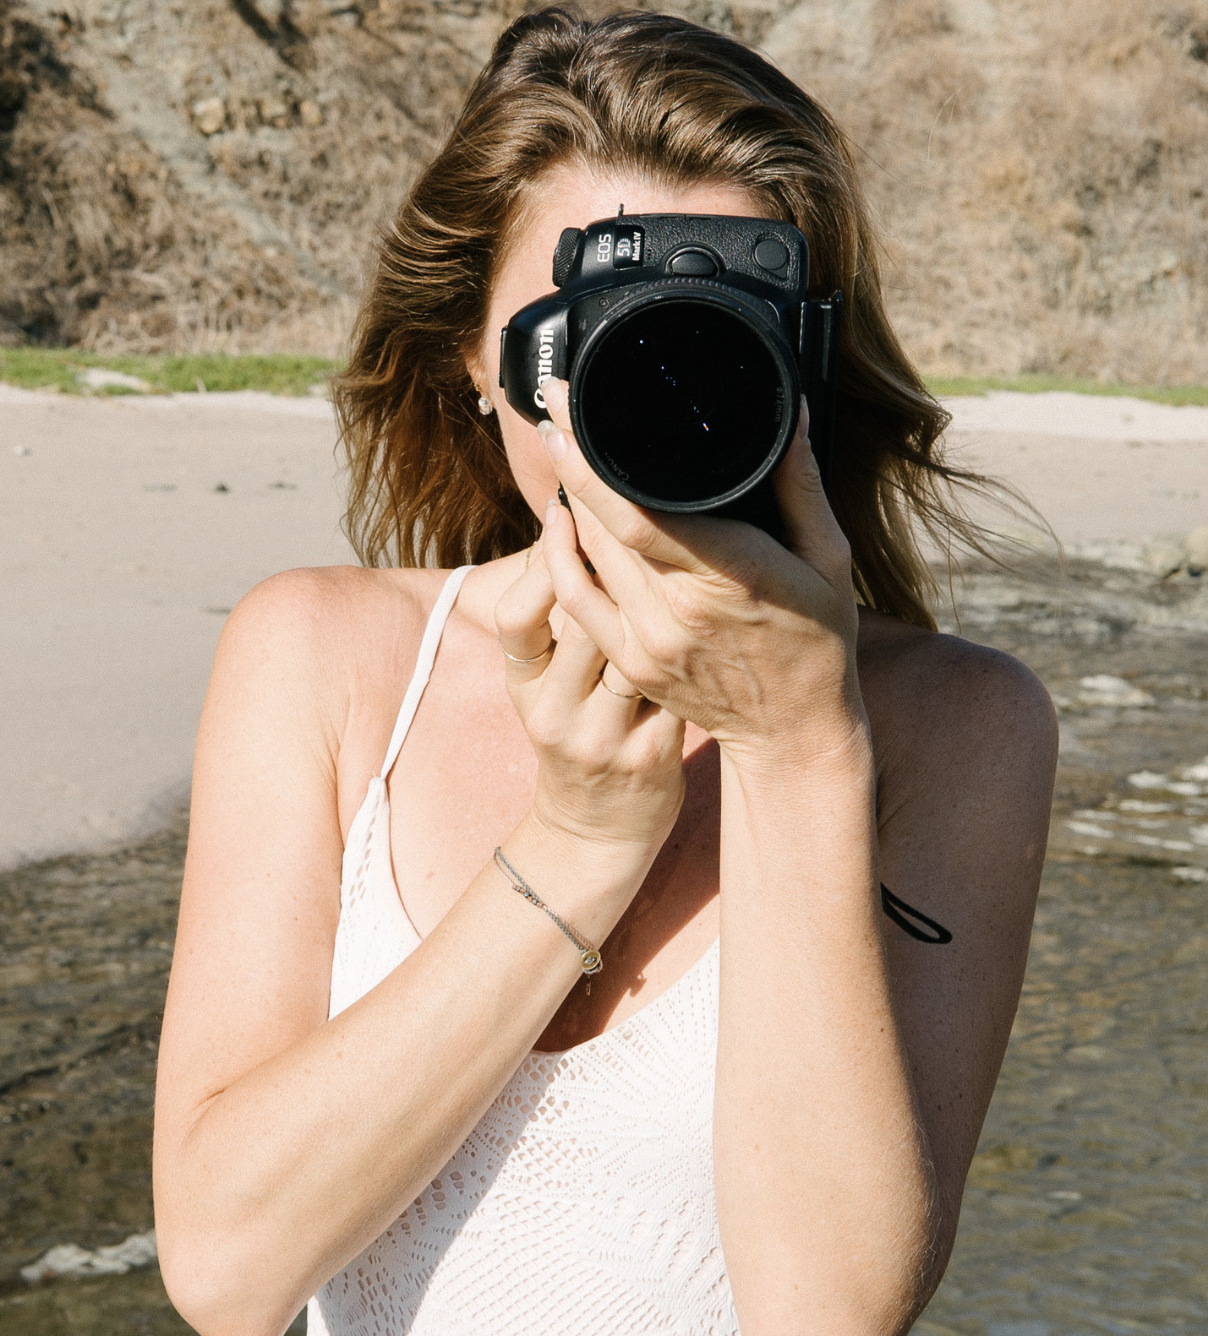 Jenna Duffy Photography - Yoga • Portraits • Lifestyle • Retreats// +1-347-453-6690 on what's app // jennaduffy@gmail.com